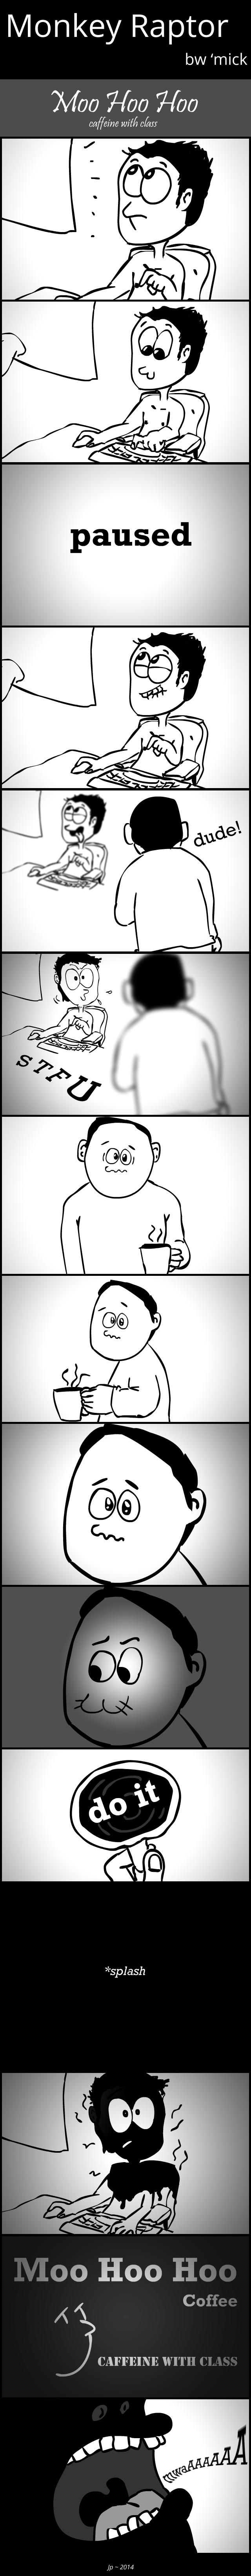 Monkey Raptor comic strip : Moo Hoo Hoo, caffeine with class